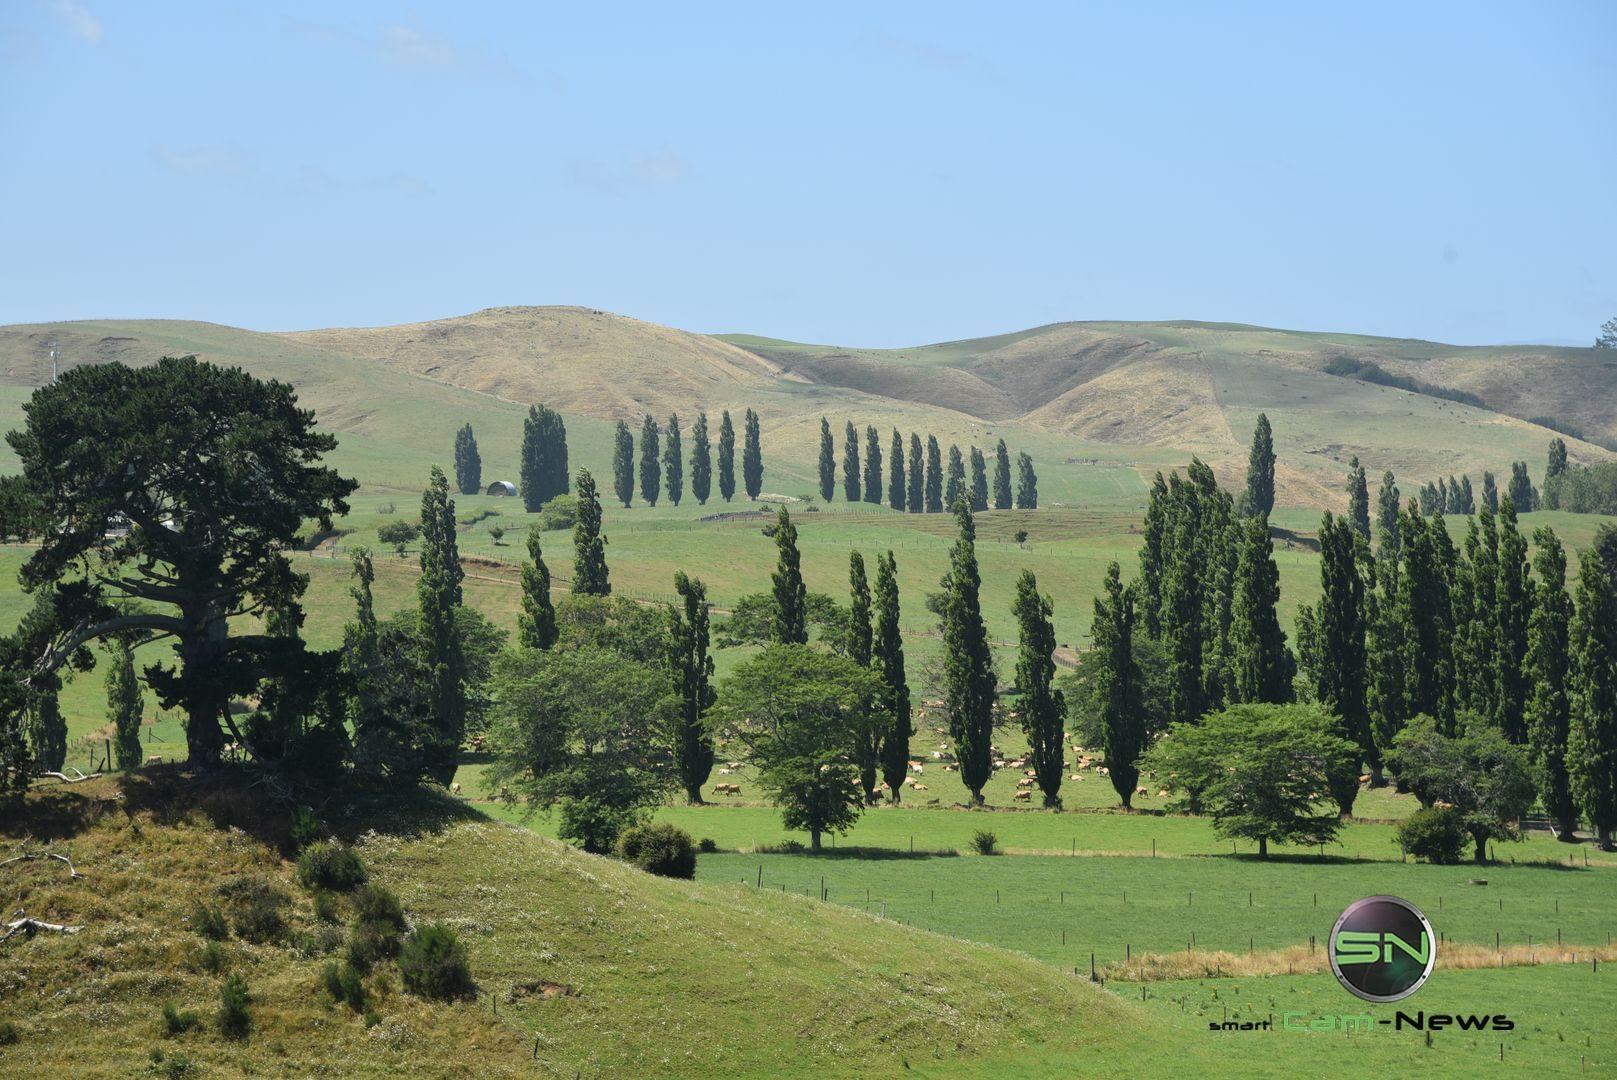 Auckland Neuseeland Landschaft - Nikon D750 - SmartCamNews